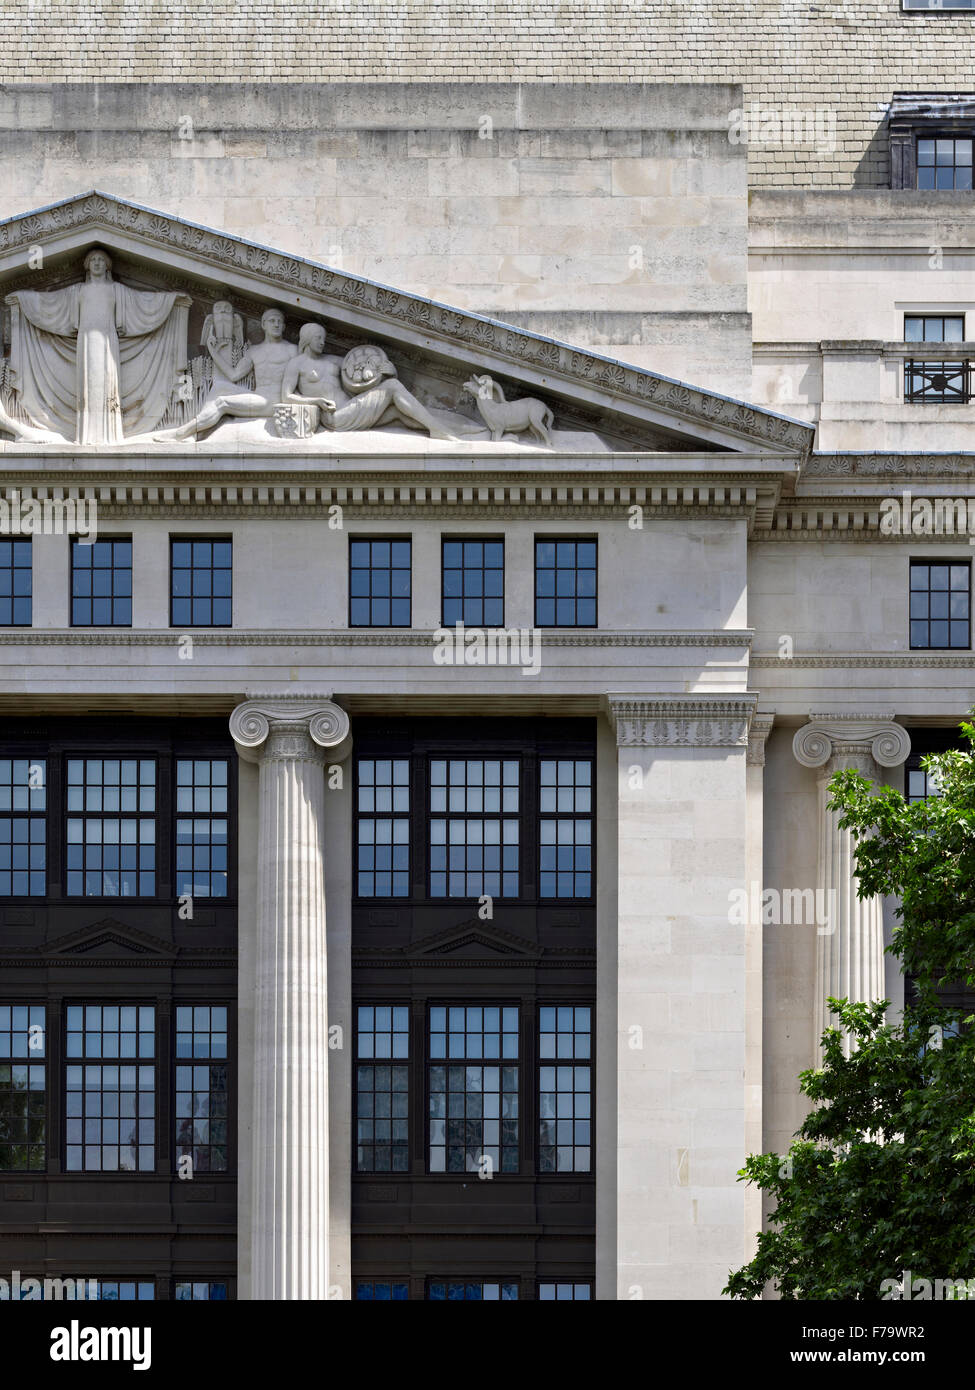 Pediment exterior of Victoria House, Bloomsbury, London, England, UK Stock Photo